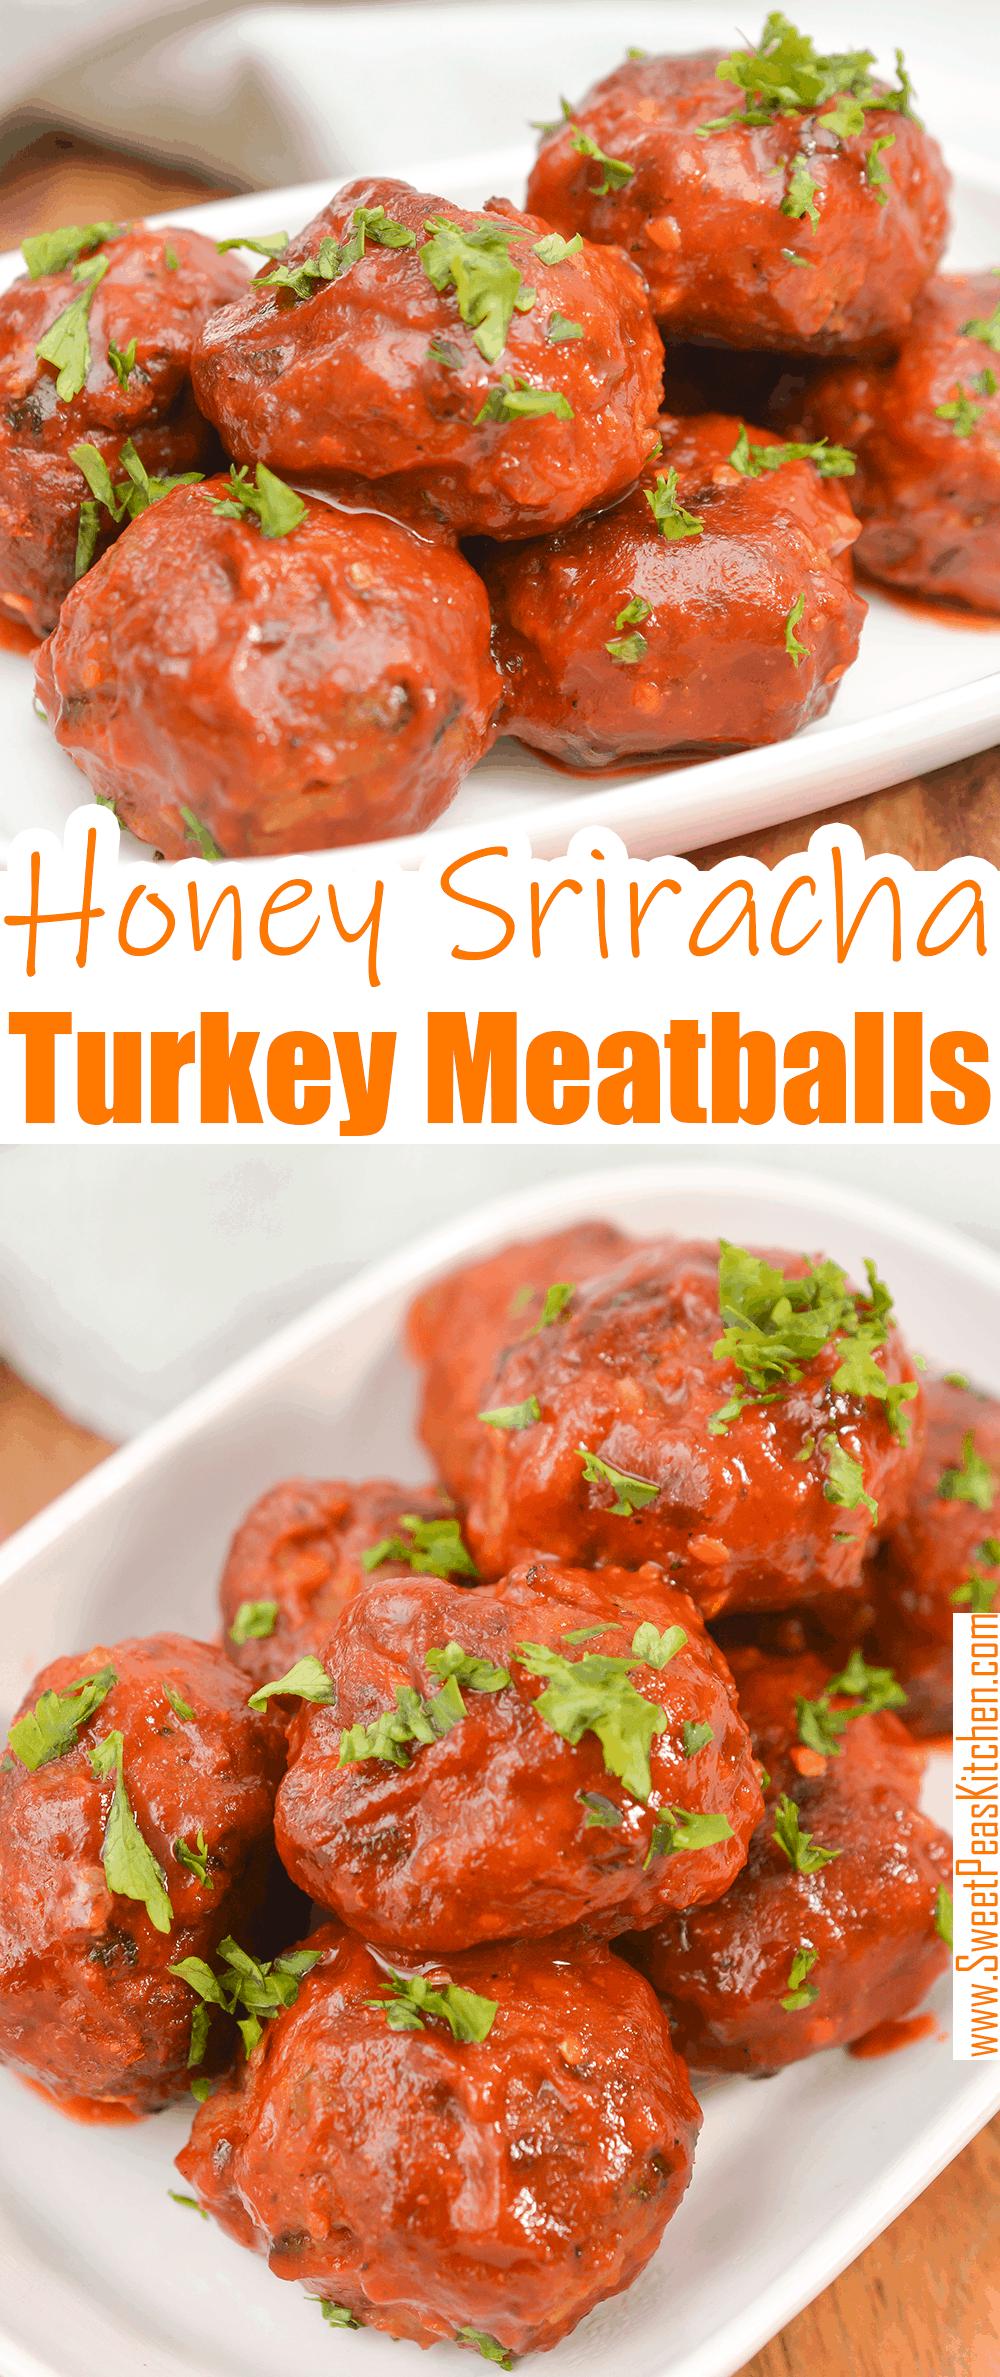 Honey Sriracha Turkey Meatballs